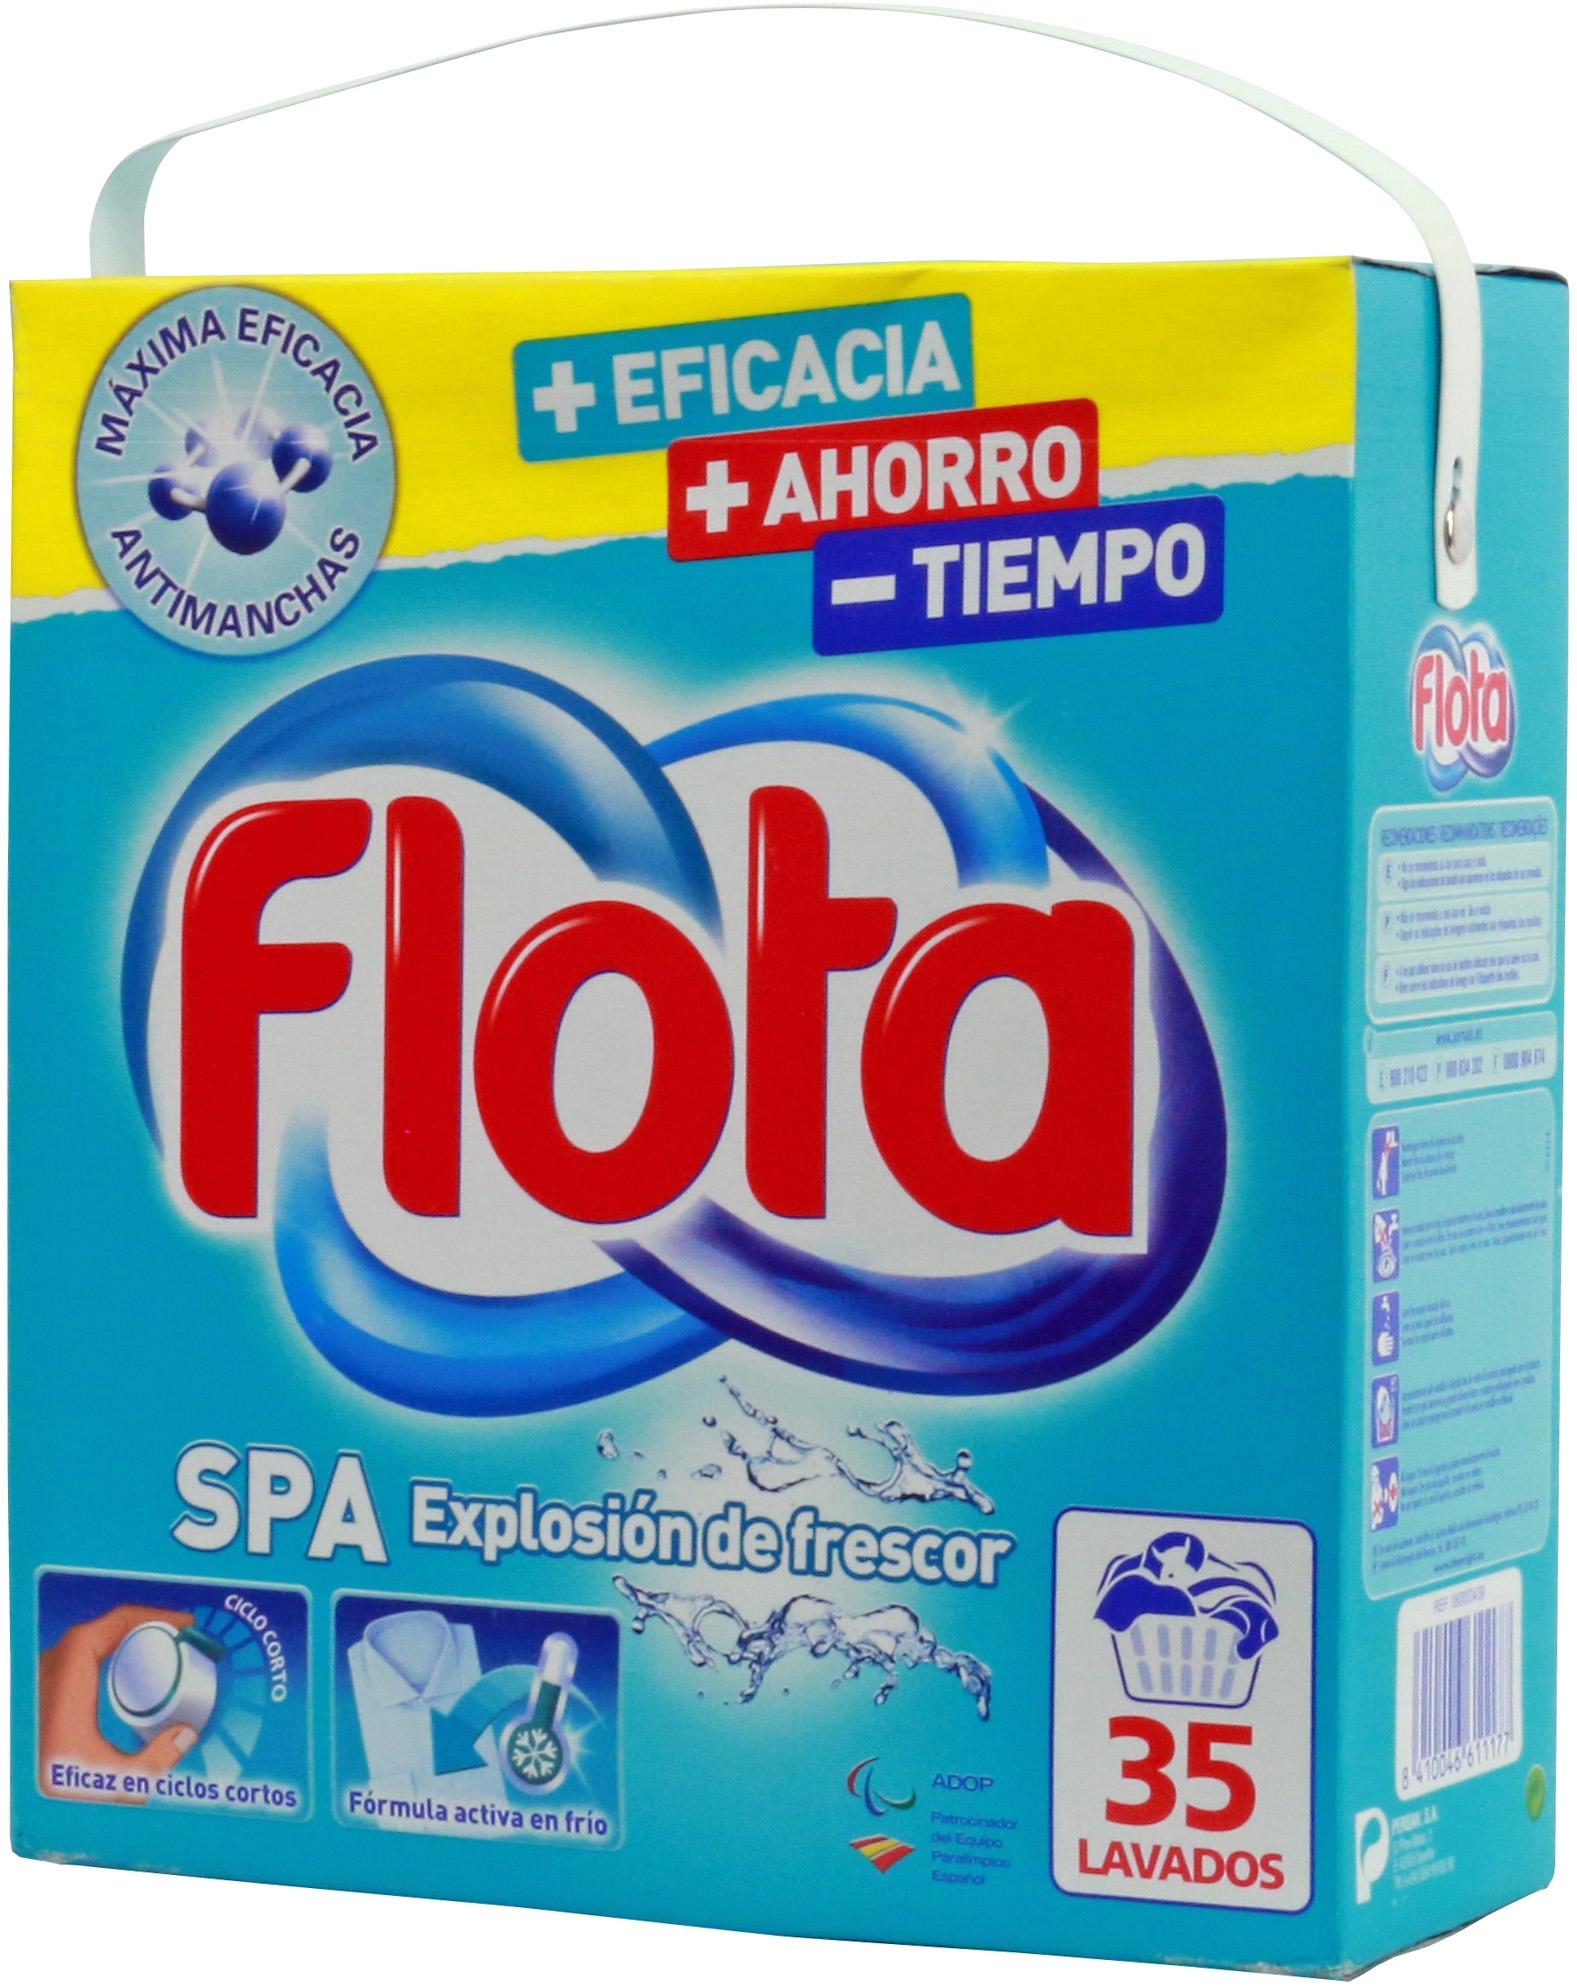 An Lisis De Flota Spa Polvo Comparador De Detergentes Para  ~ Mejor Detergente Lavadora Calidad Precio